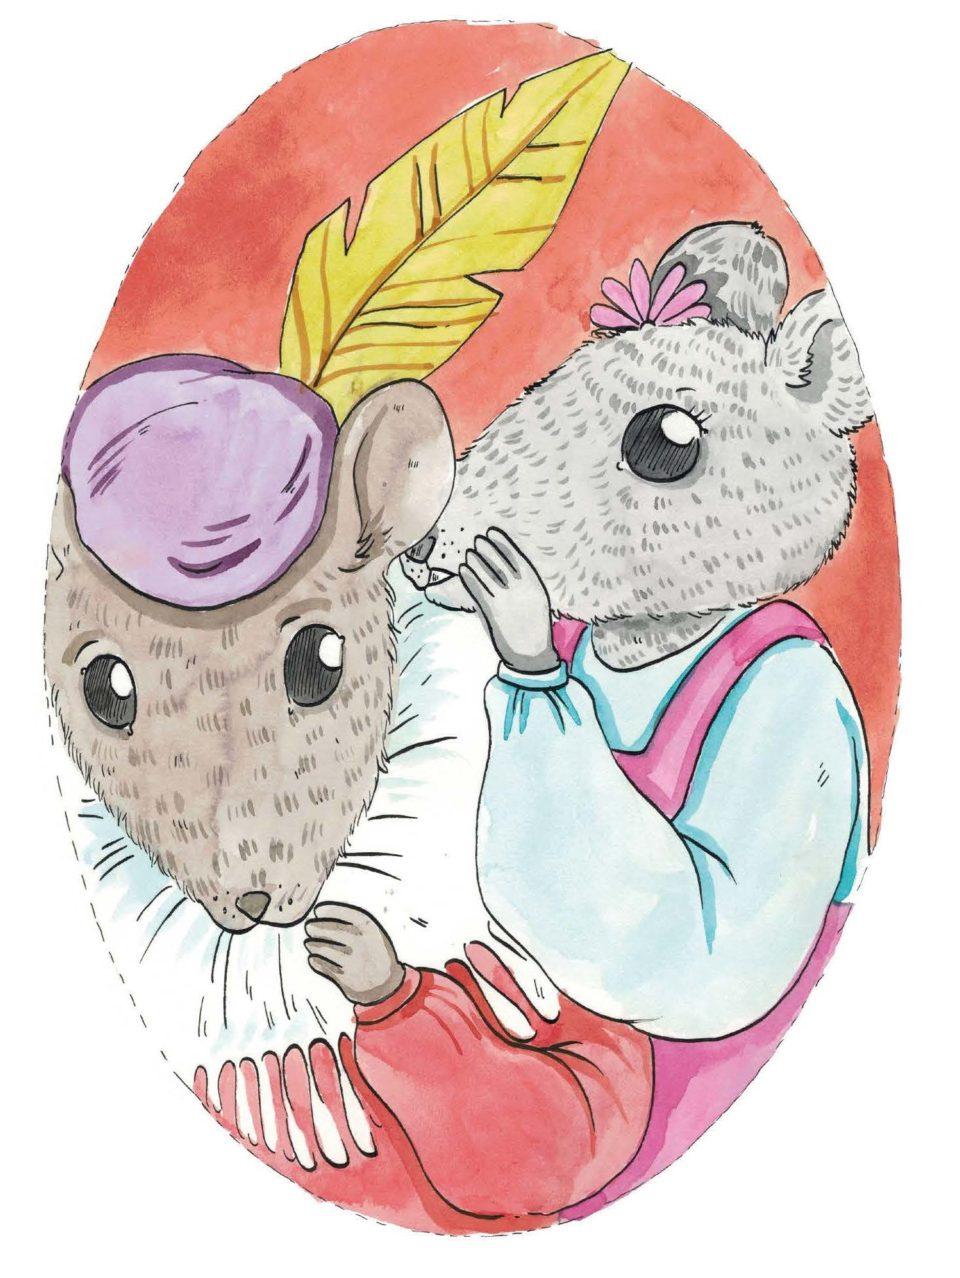 Two mice talking